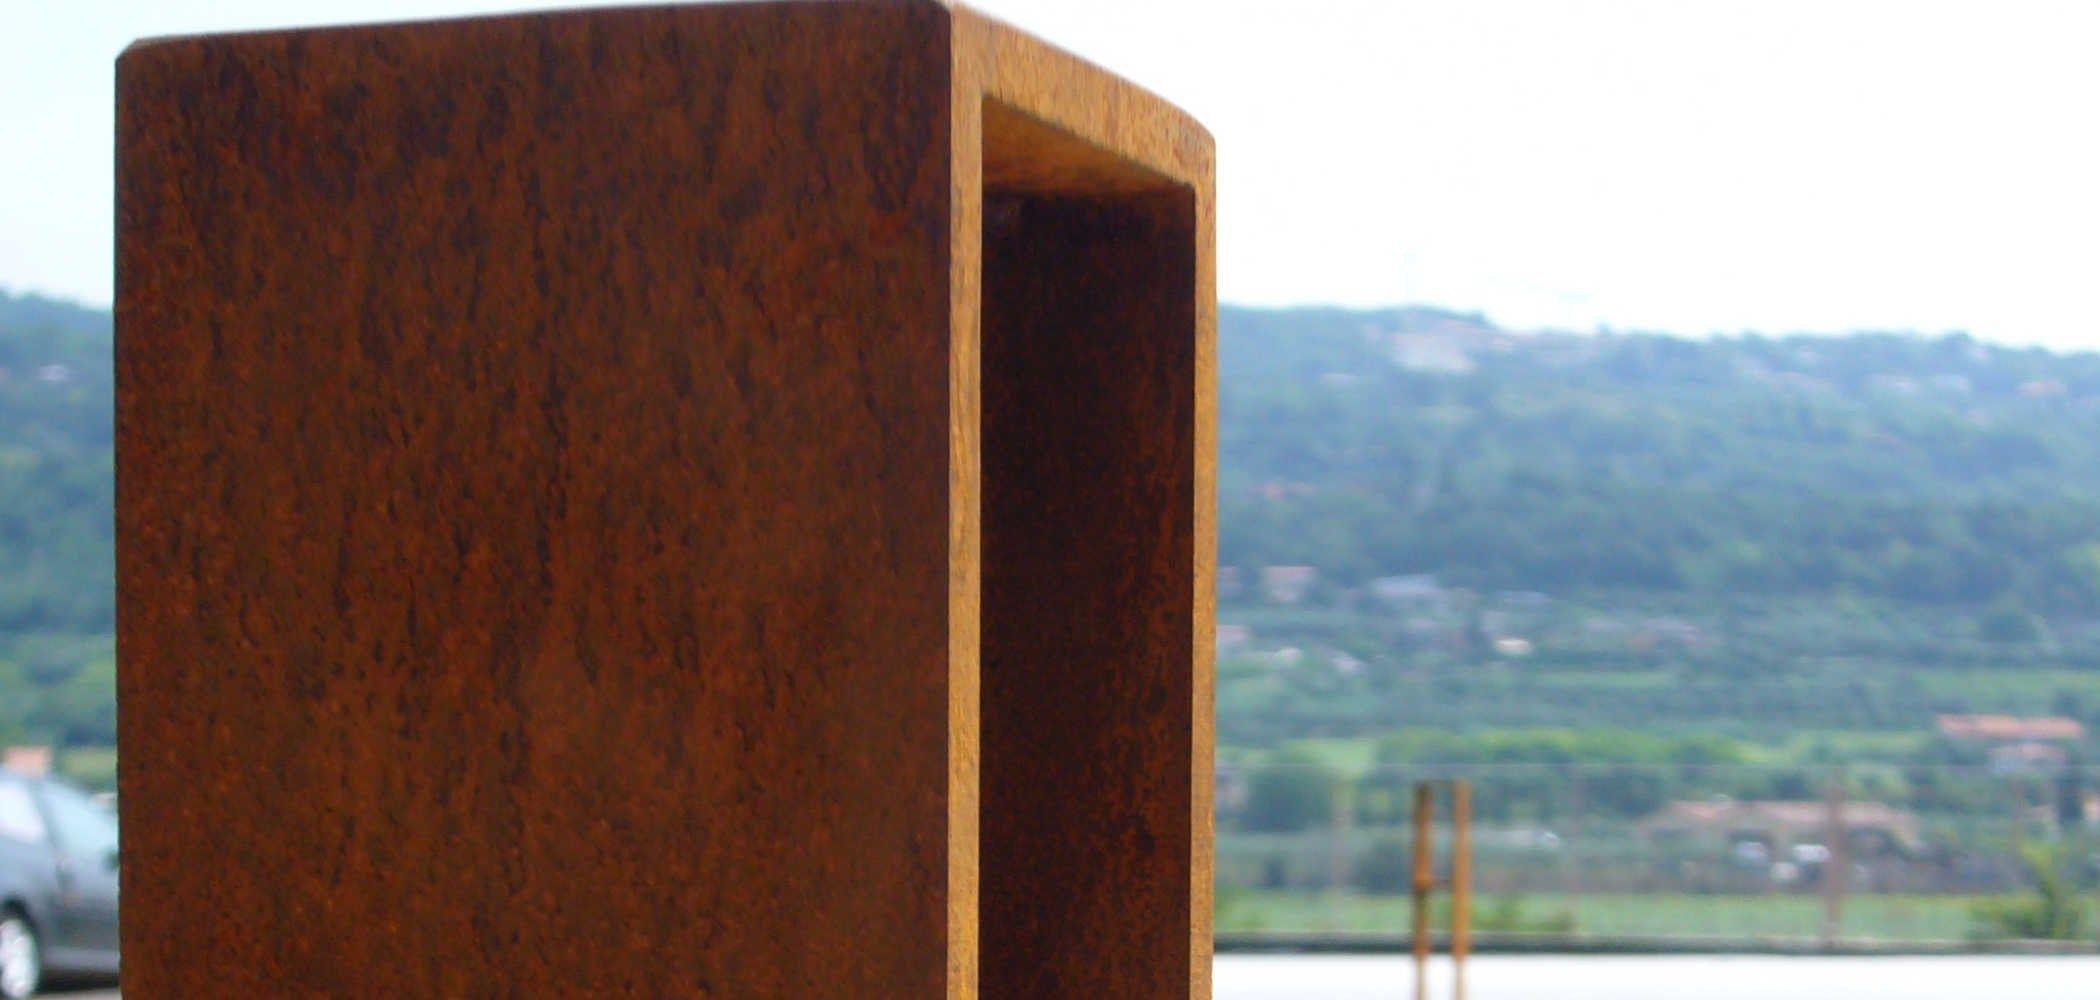 corten bollard post with base plate moka by metalco. Black Bedroom Furniture Sets. Home Design Ideas